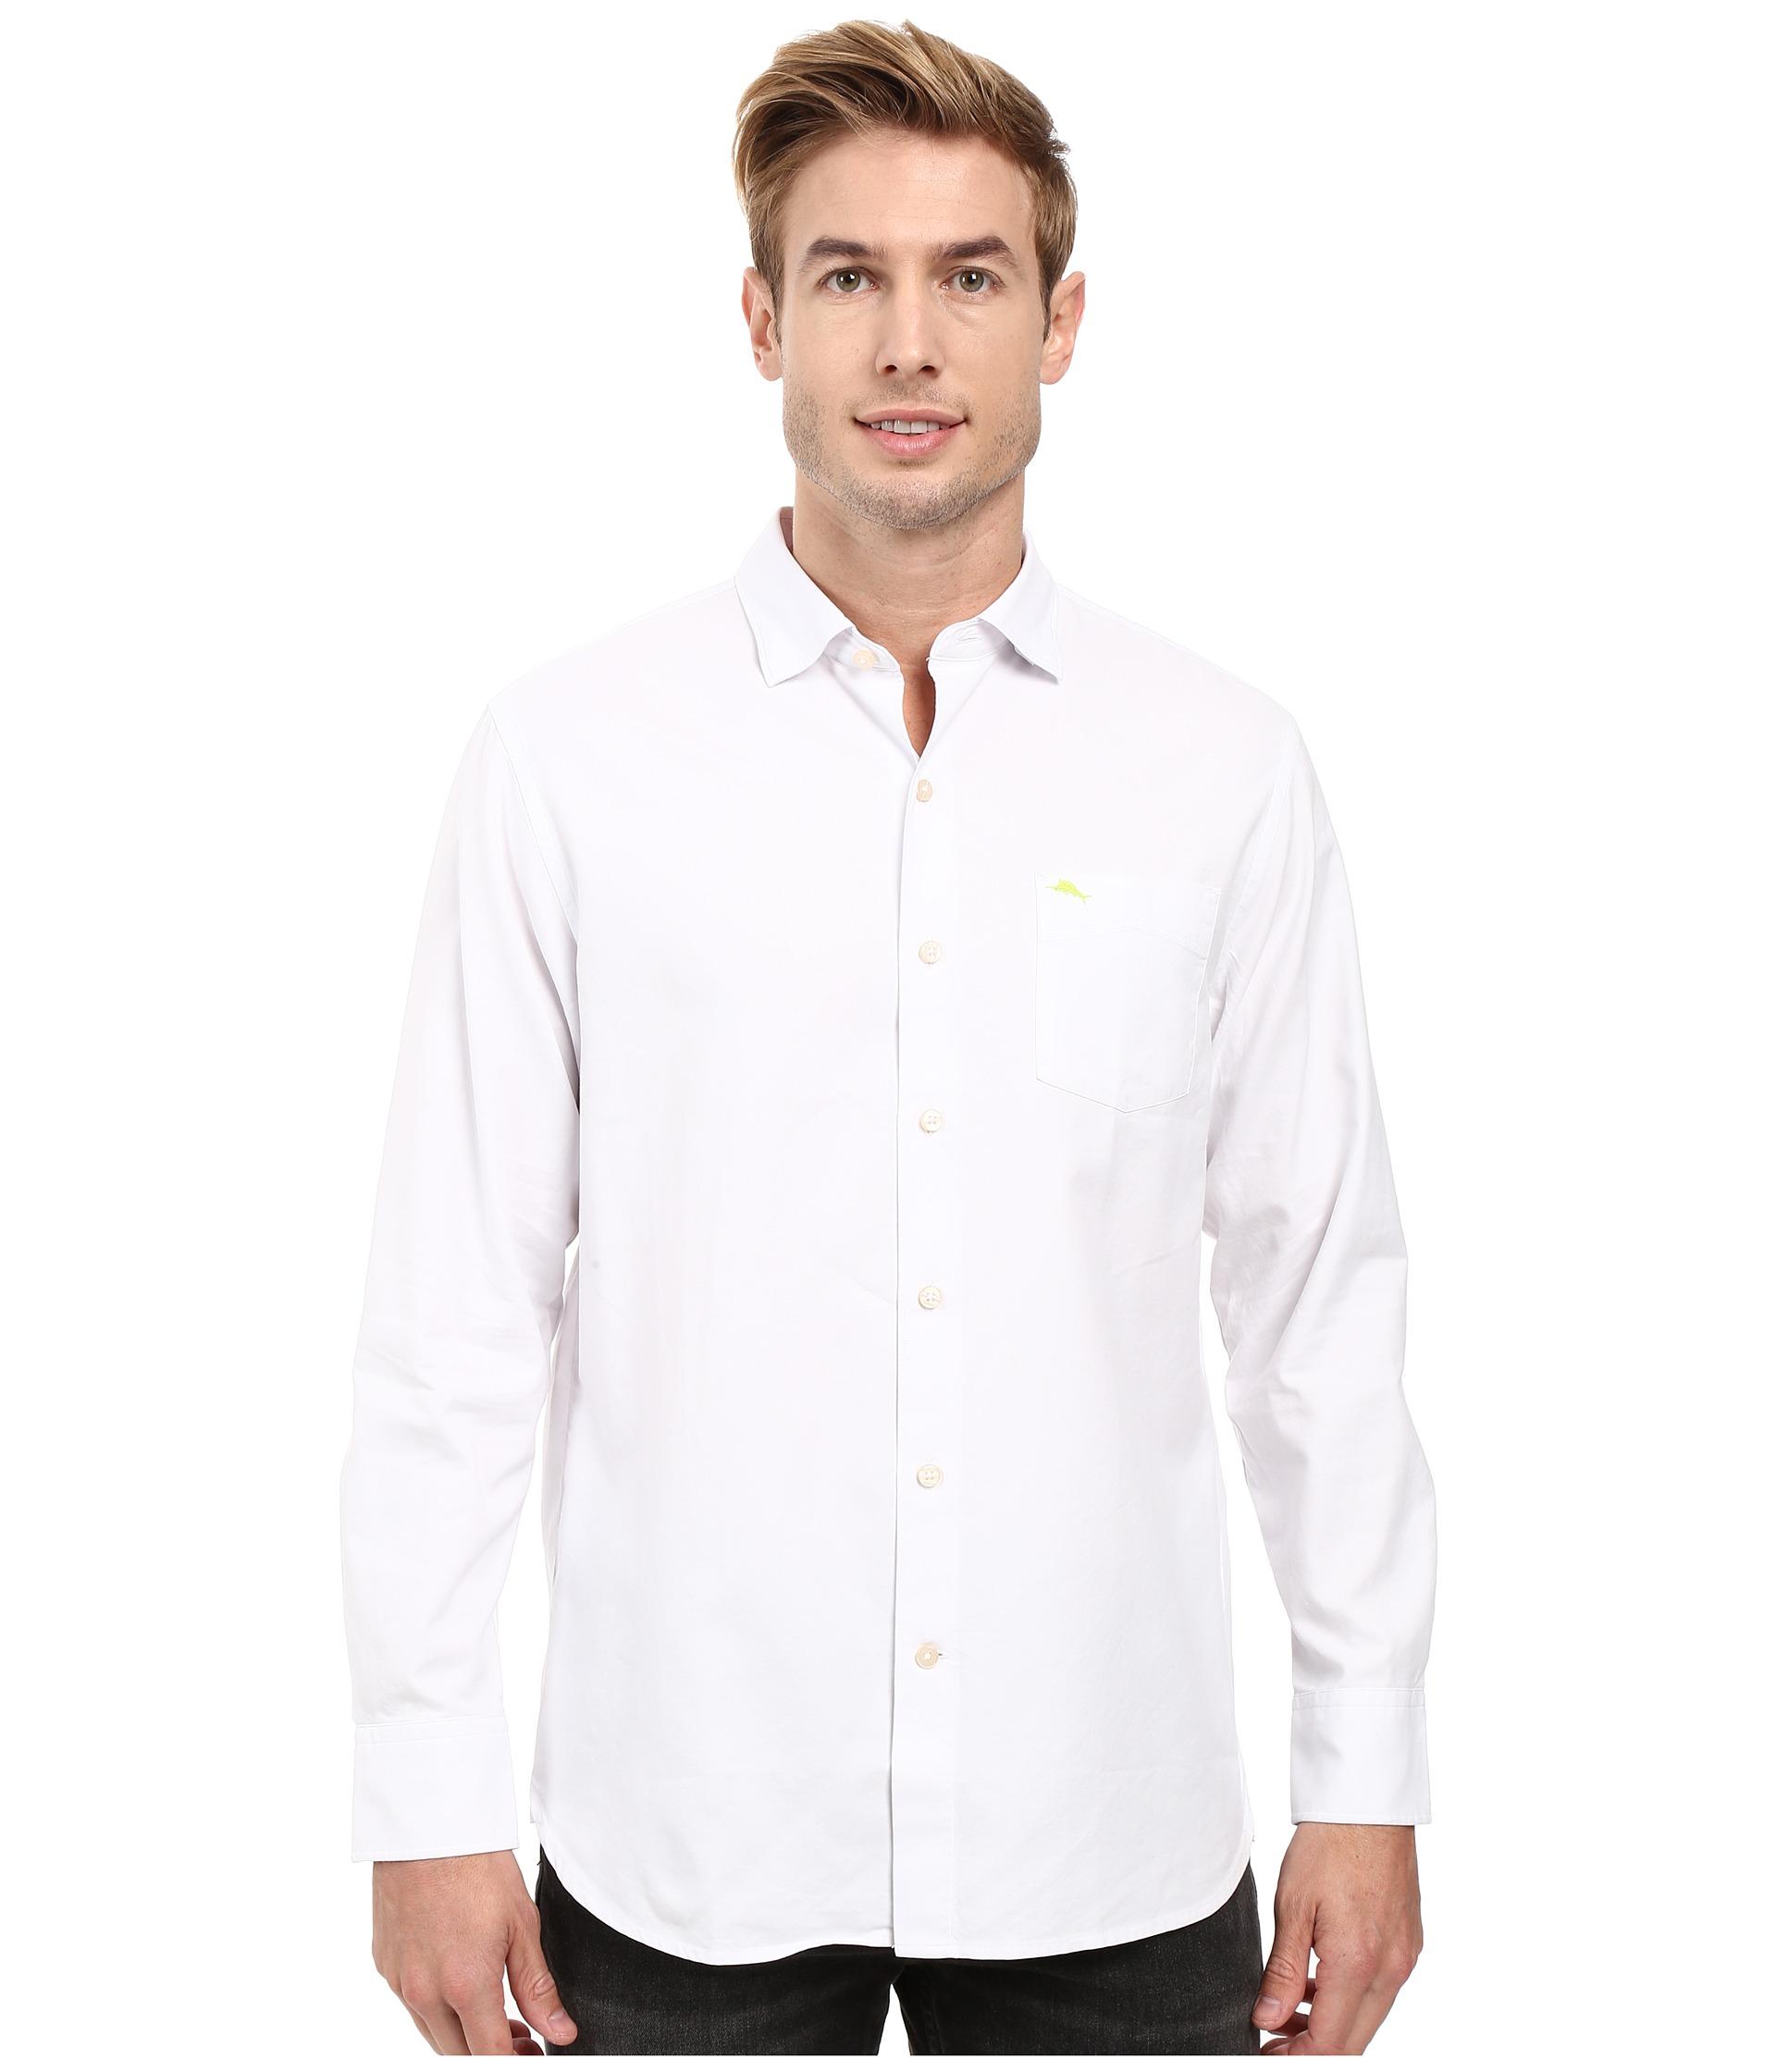 Tommy bahama island twill shirt free shipping for Tommy bahama florida shirt